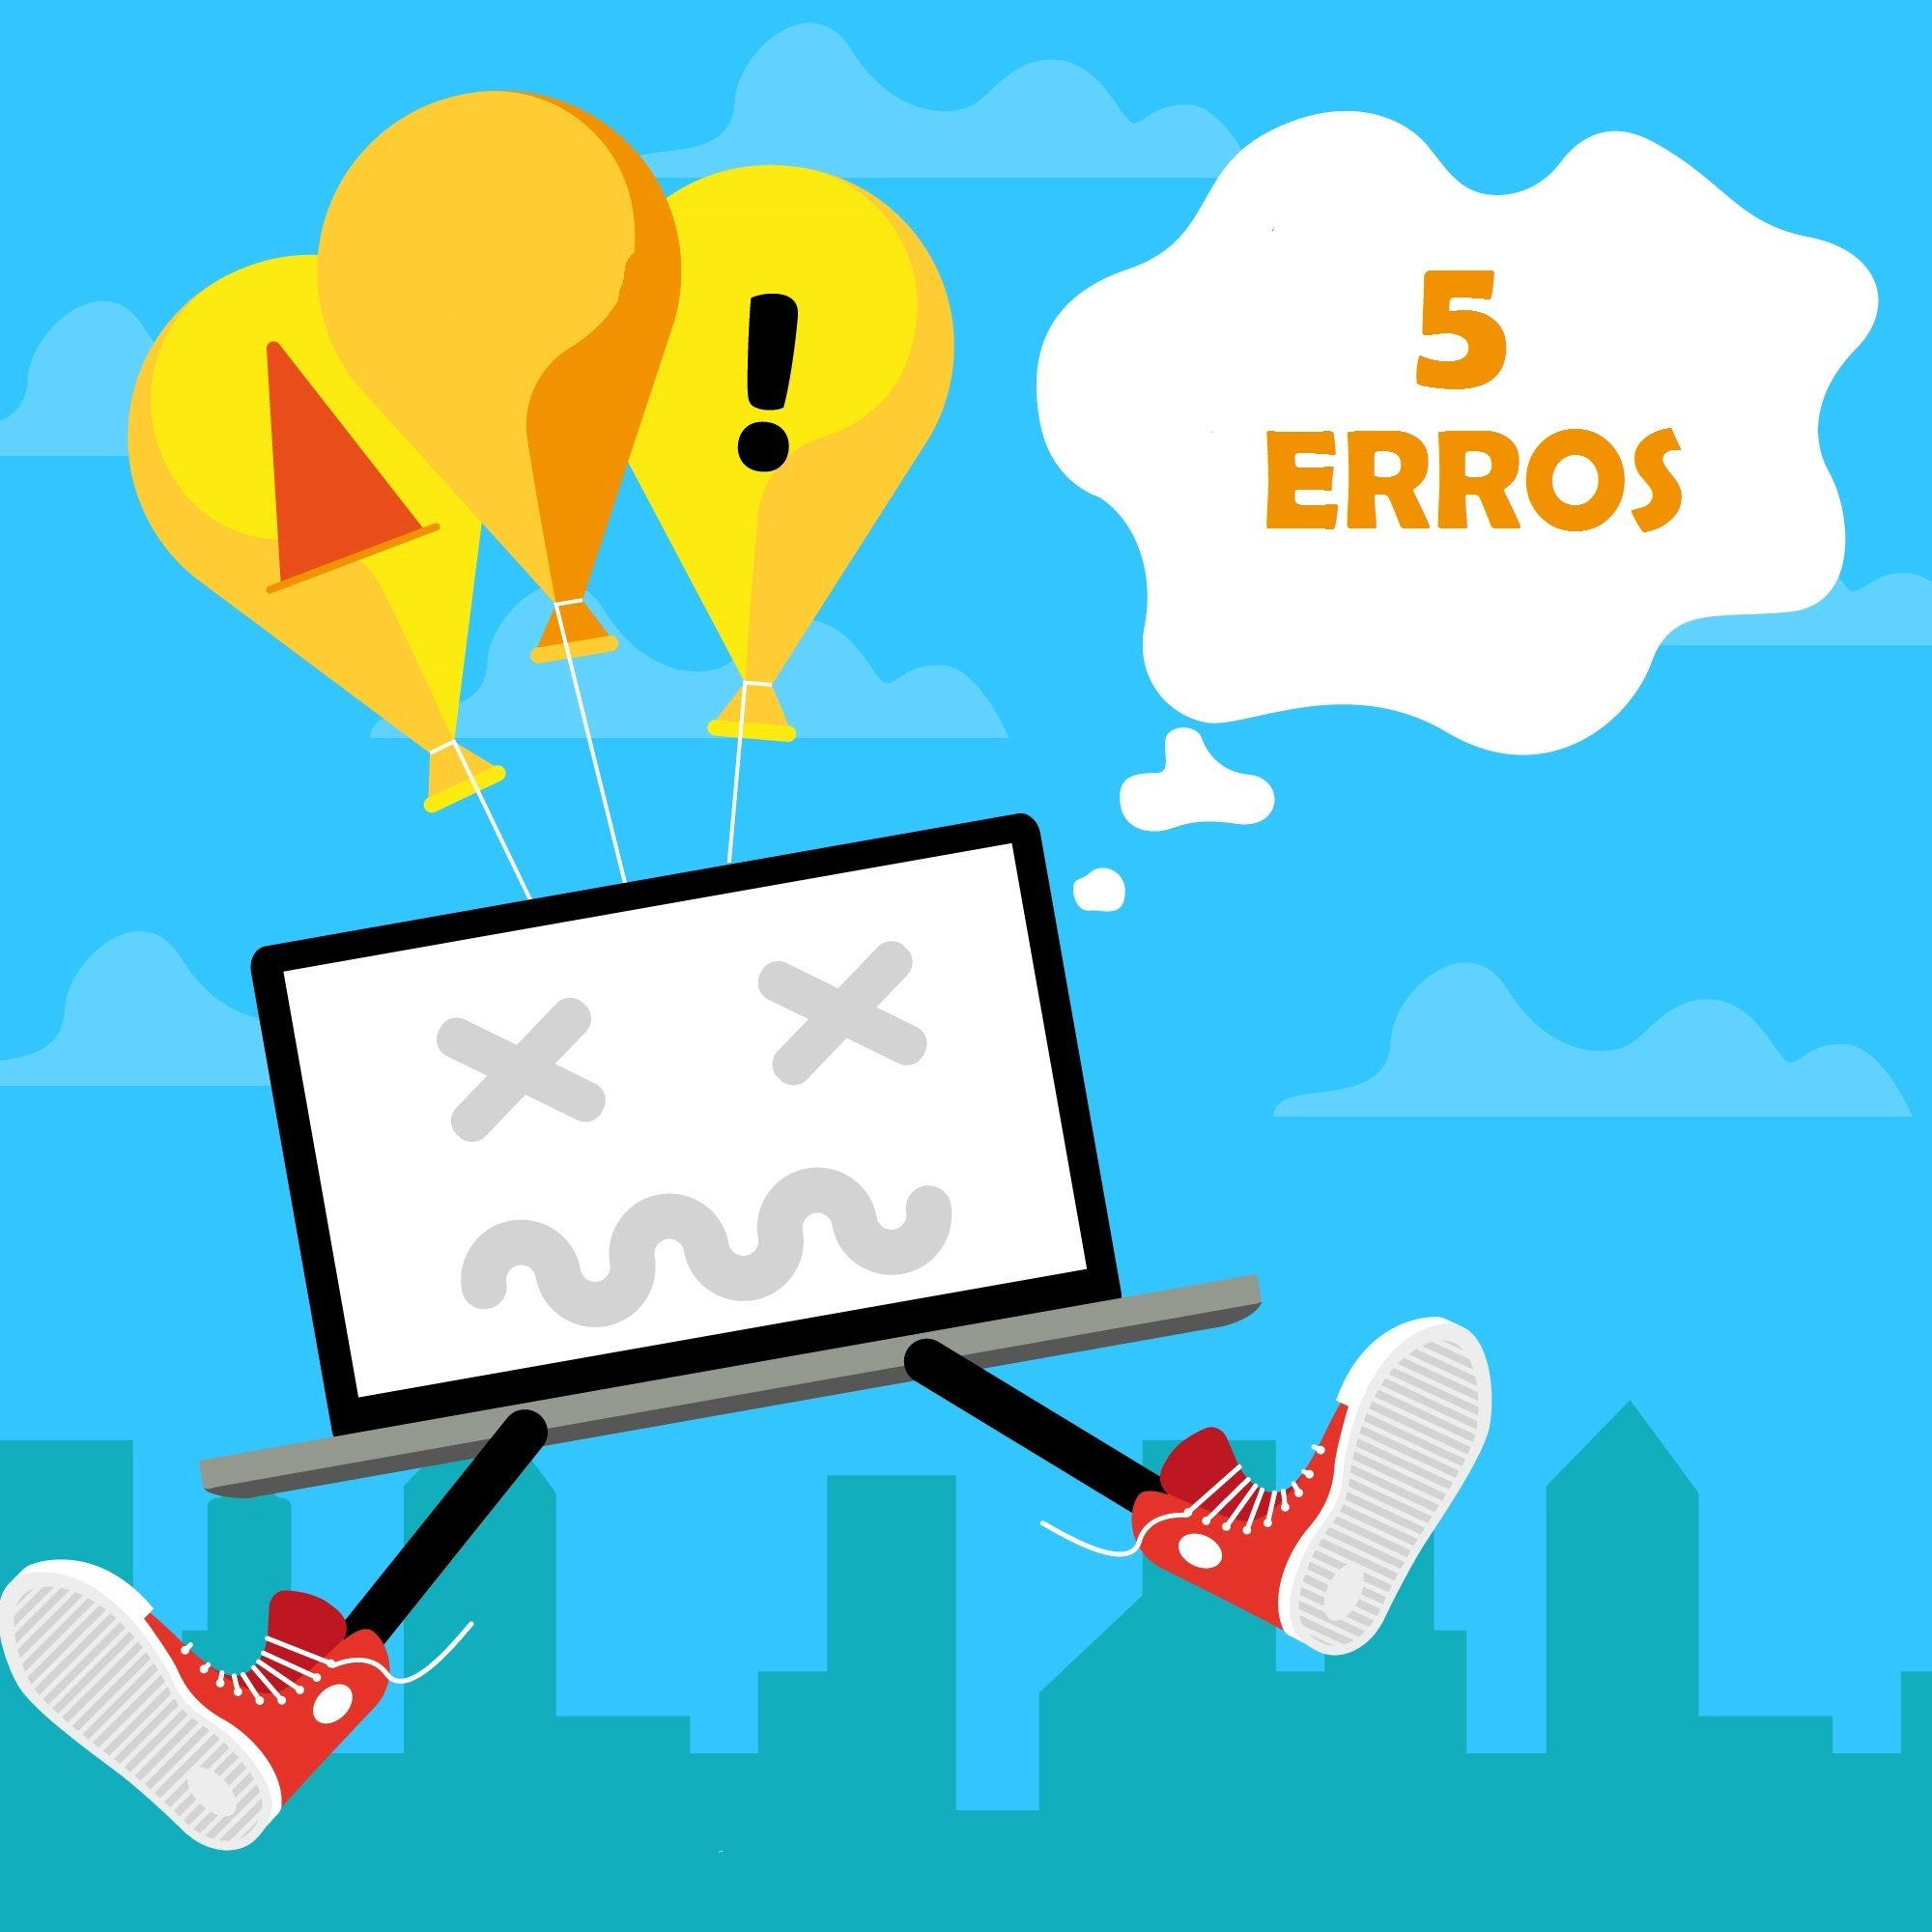 5 erros